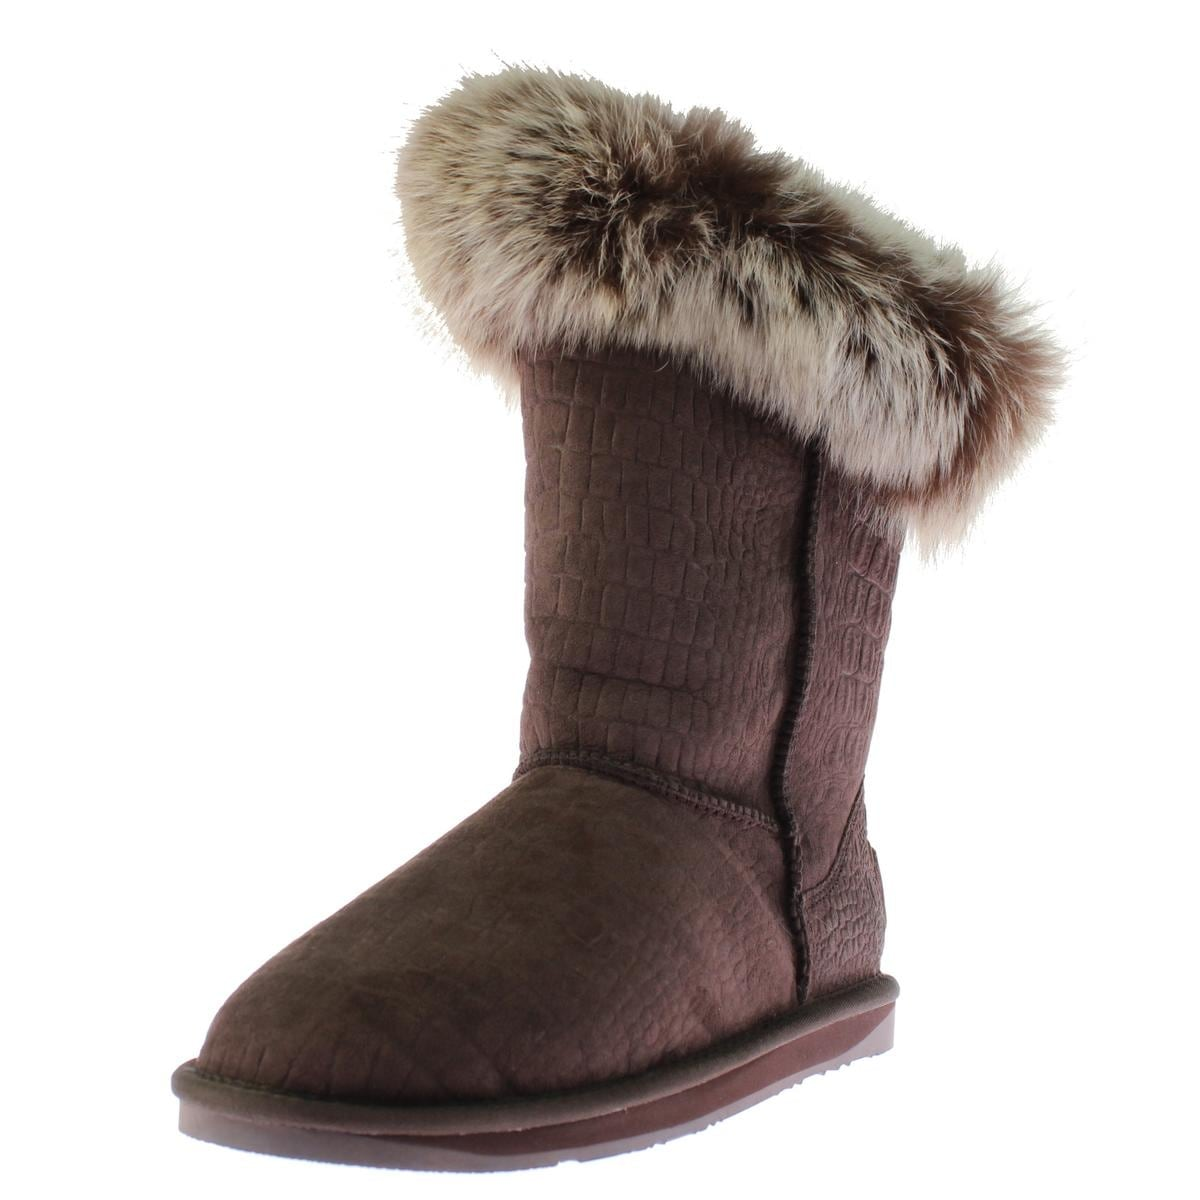 Australia Luxe Womens Foxy Short Casual Boots Sheepskin Crocodile Print - Thumbnail 3